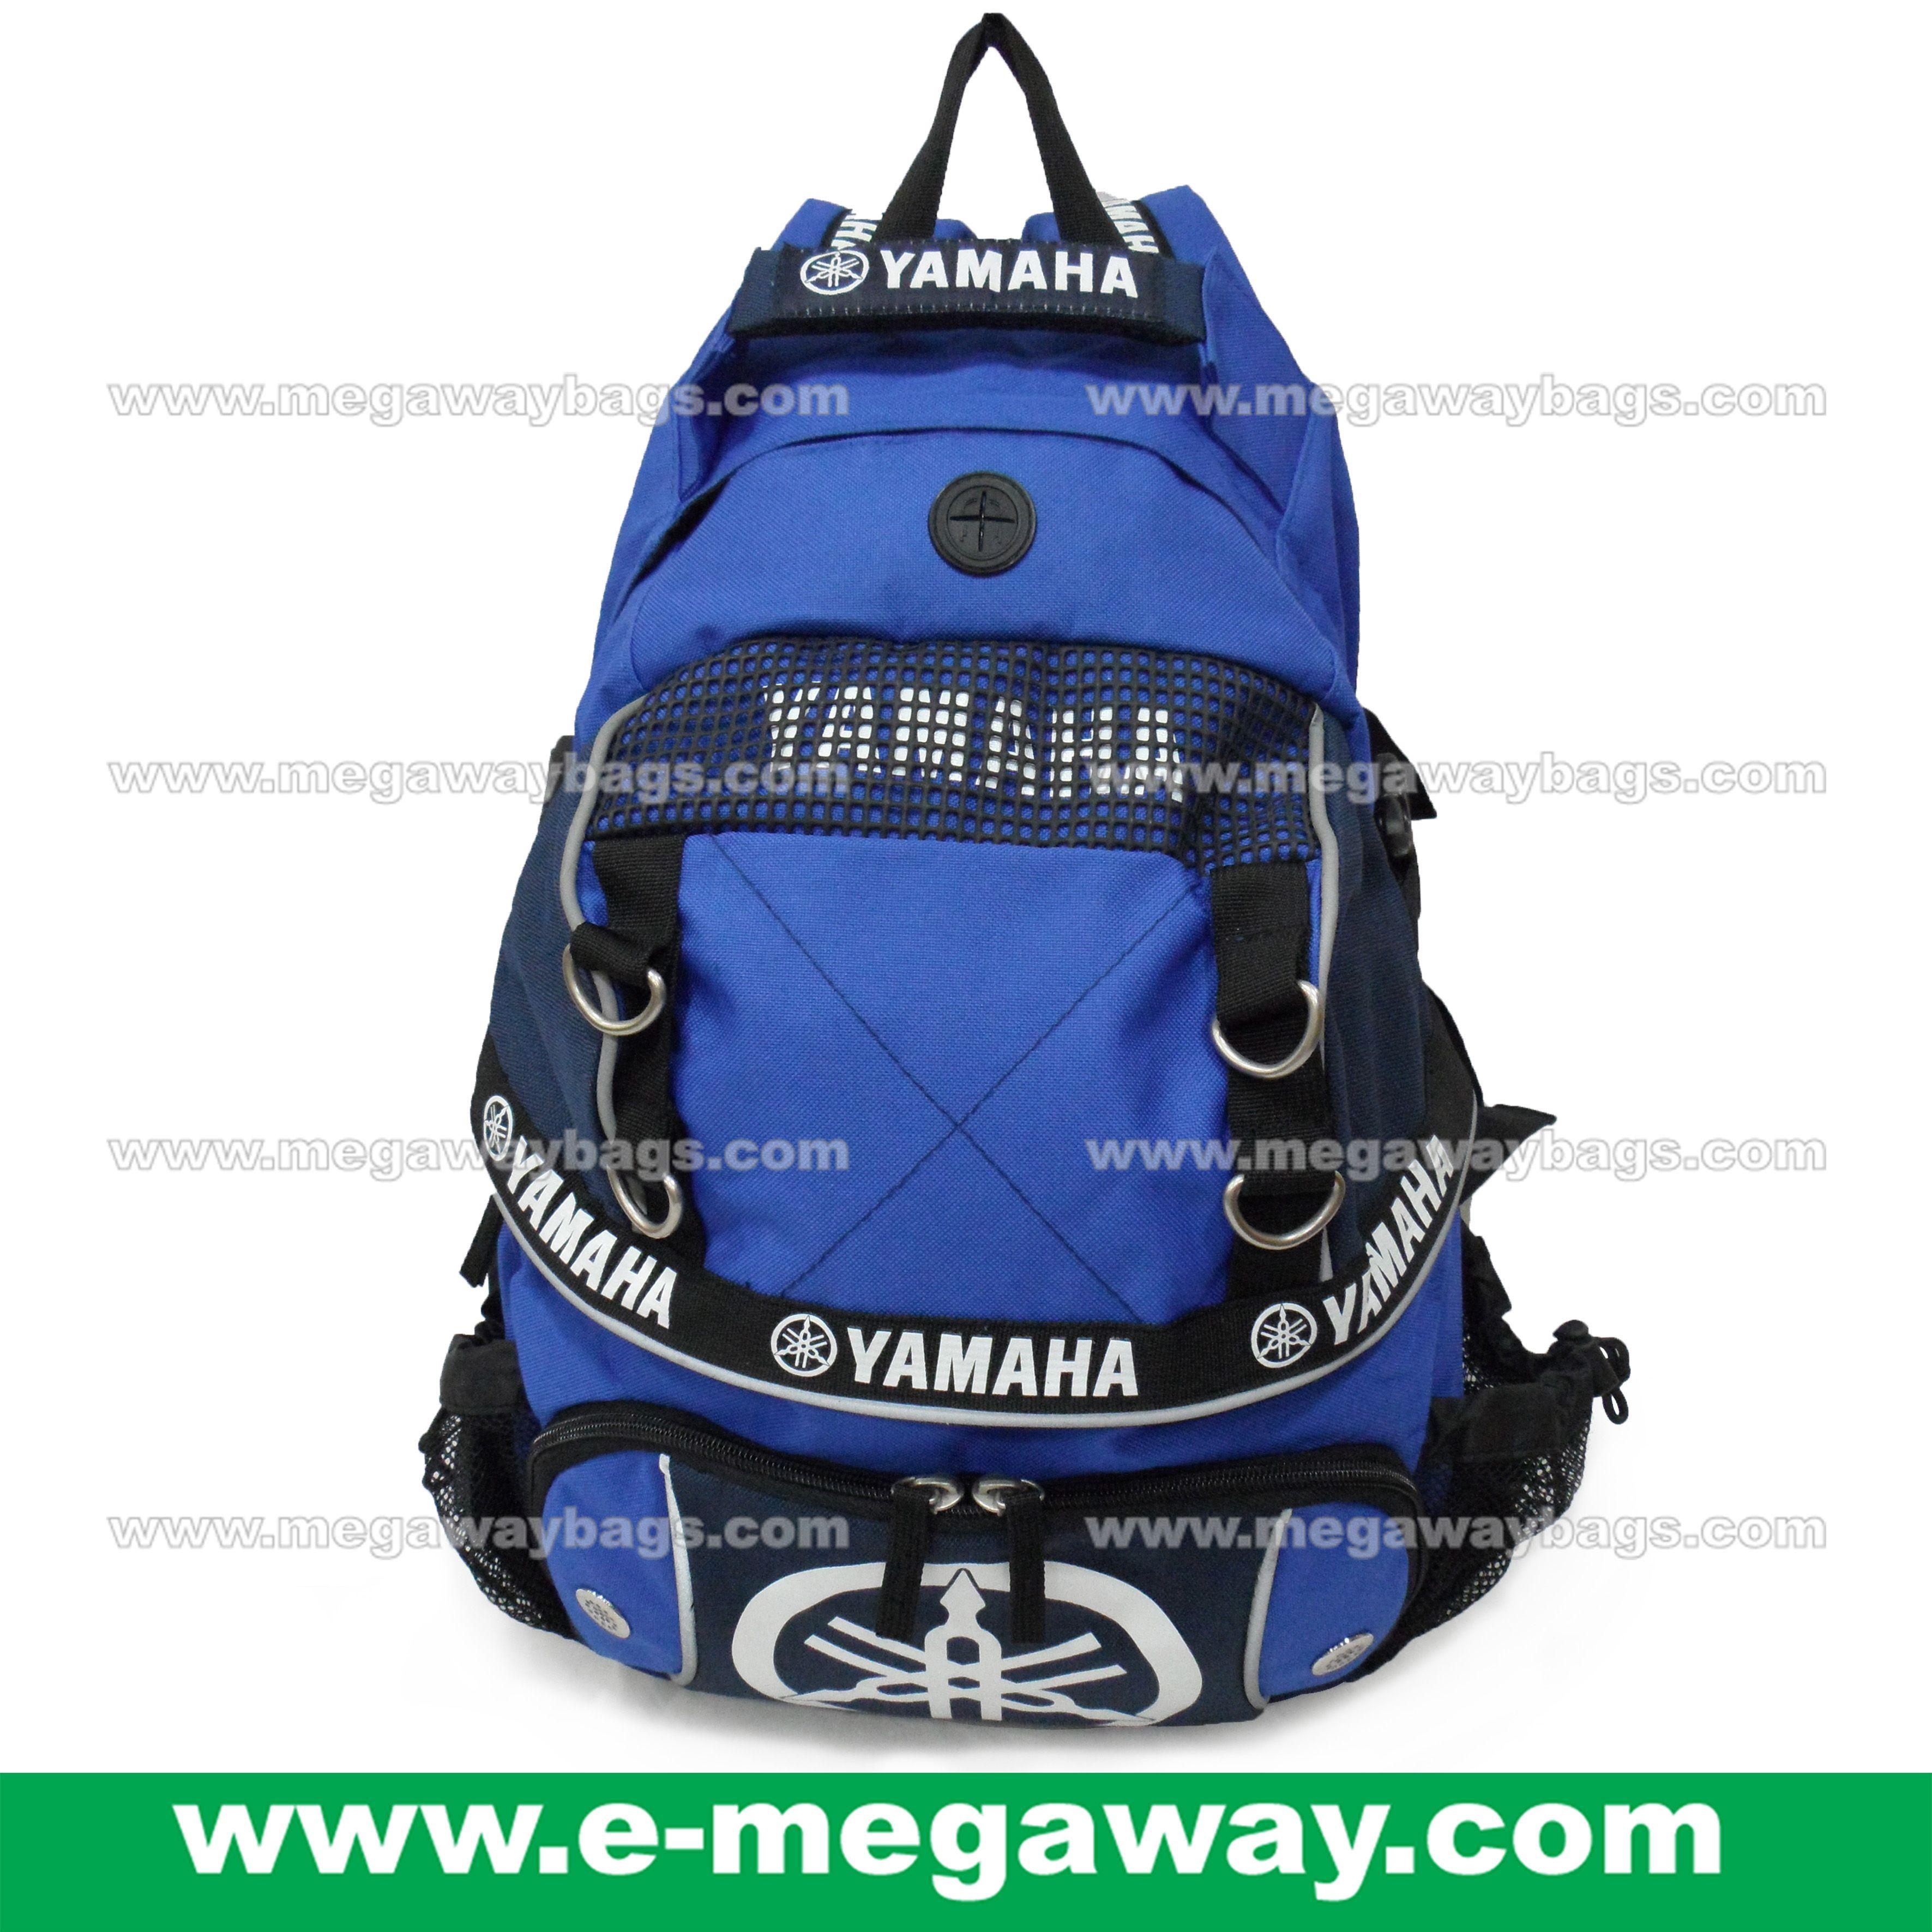 Racing Race Motorcycle Motorsport Casual BackpackBag Travel Hiking Campin